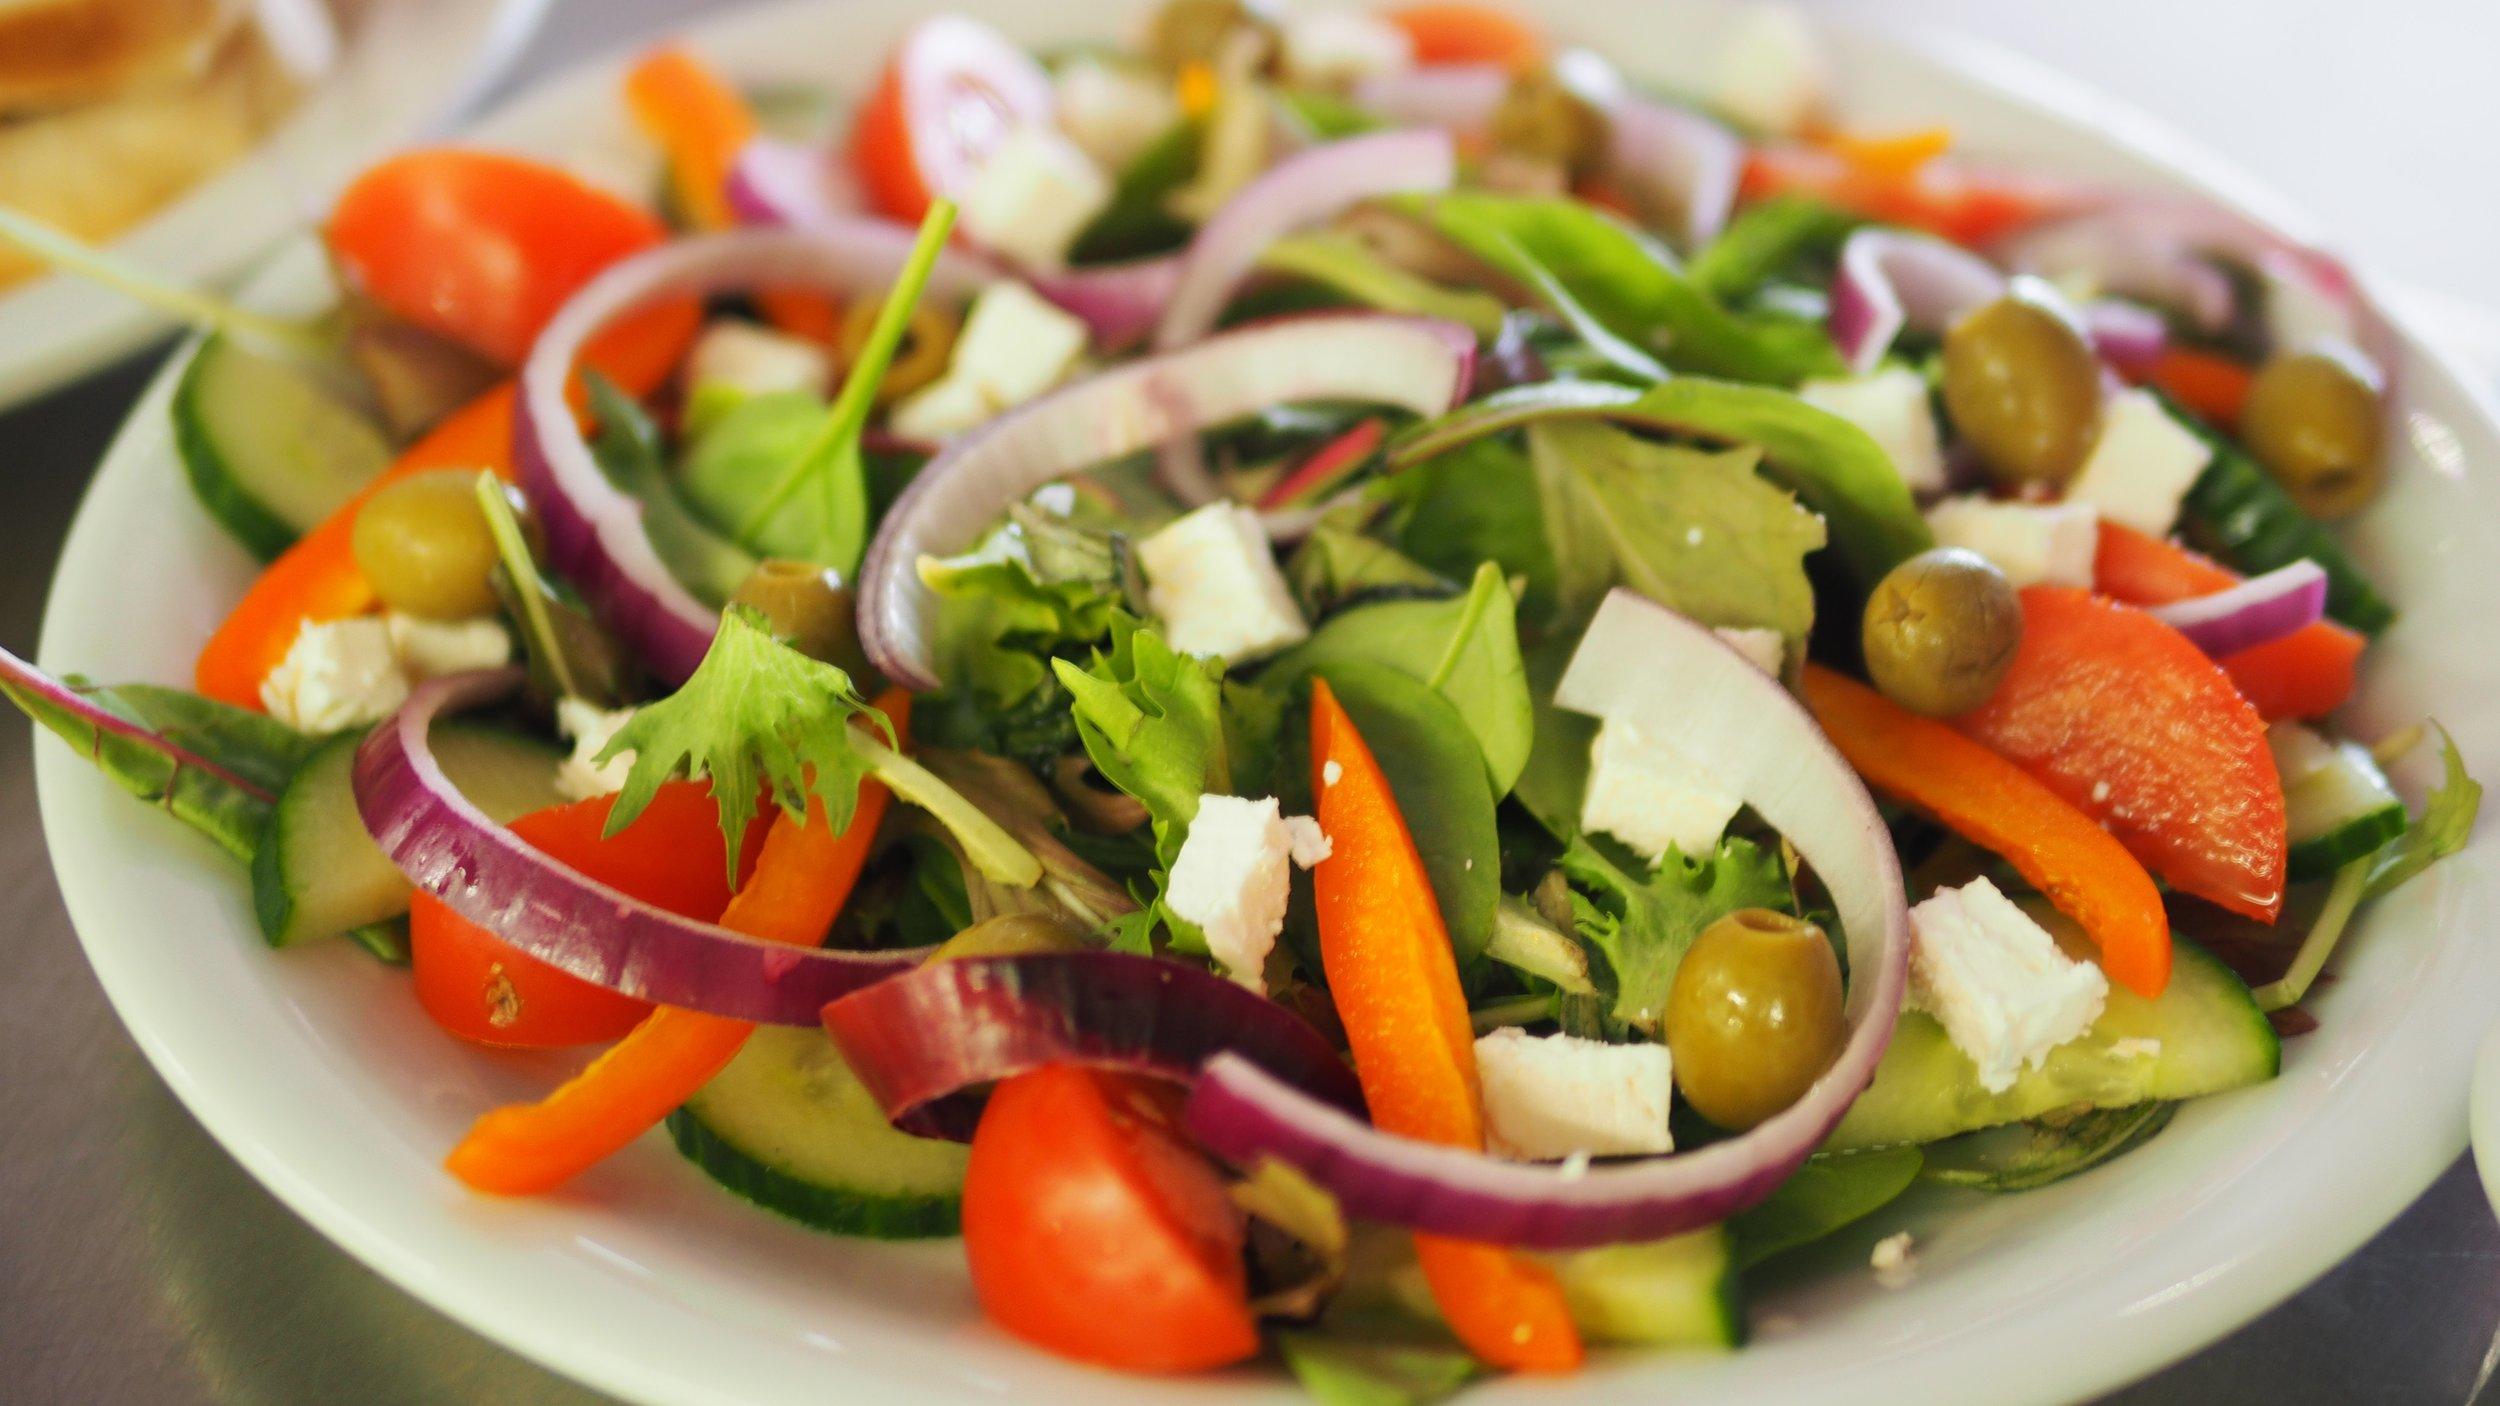 italiaanse-tomaten-salade-food-your-thought-gezond-eten